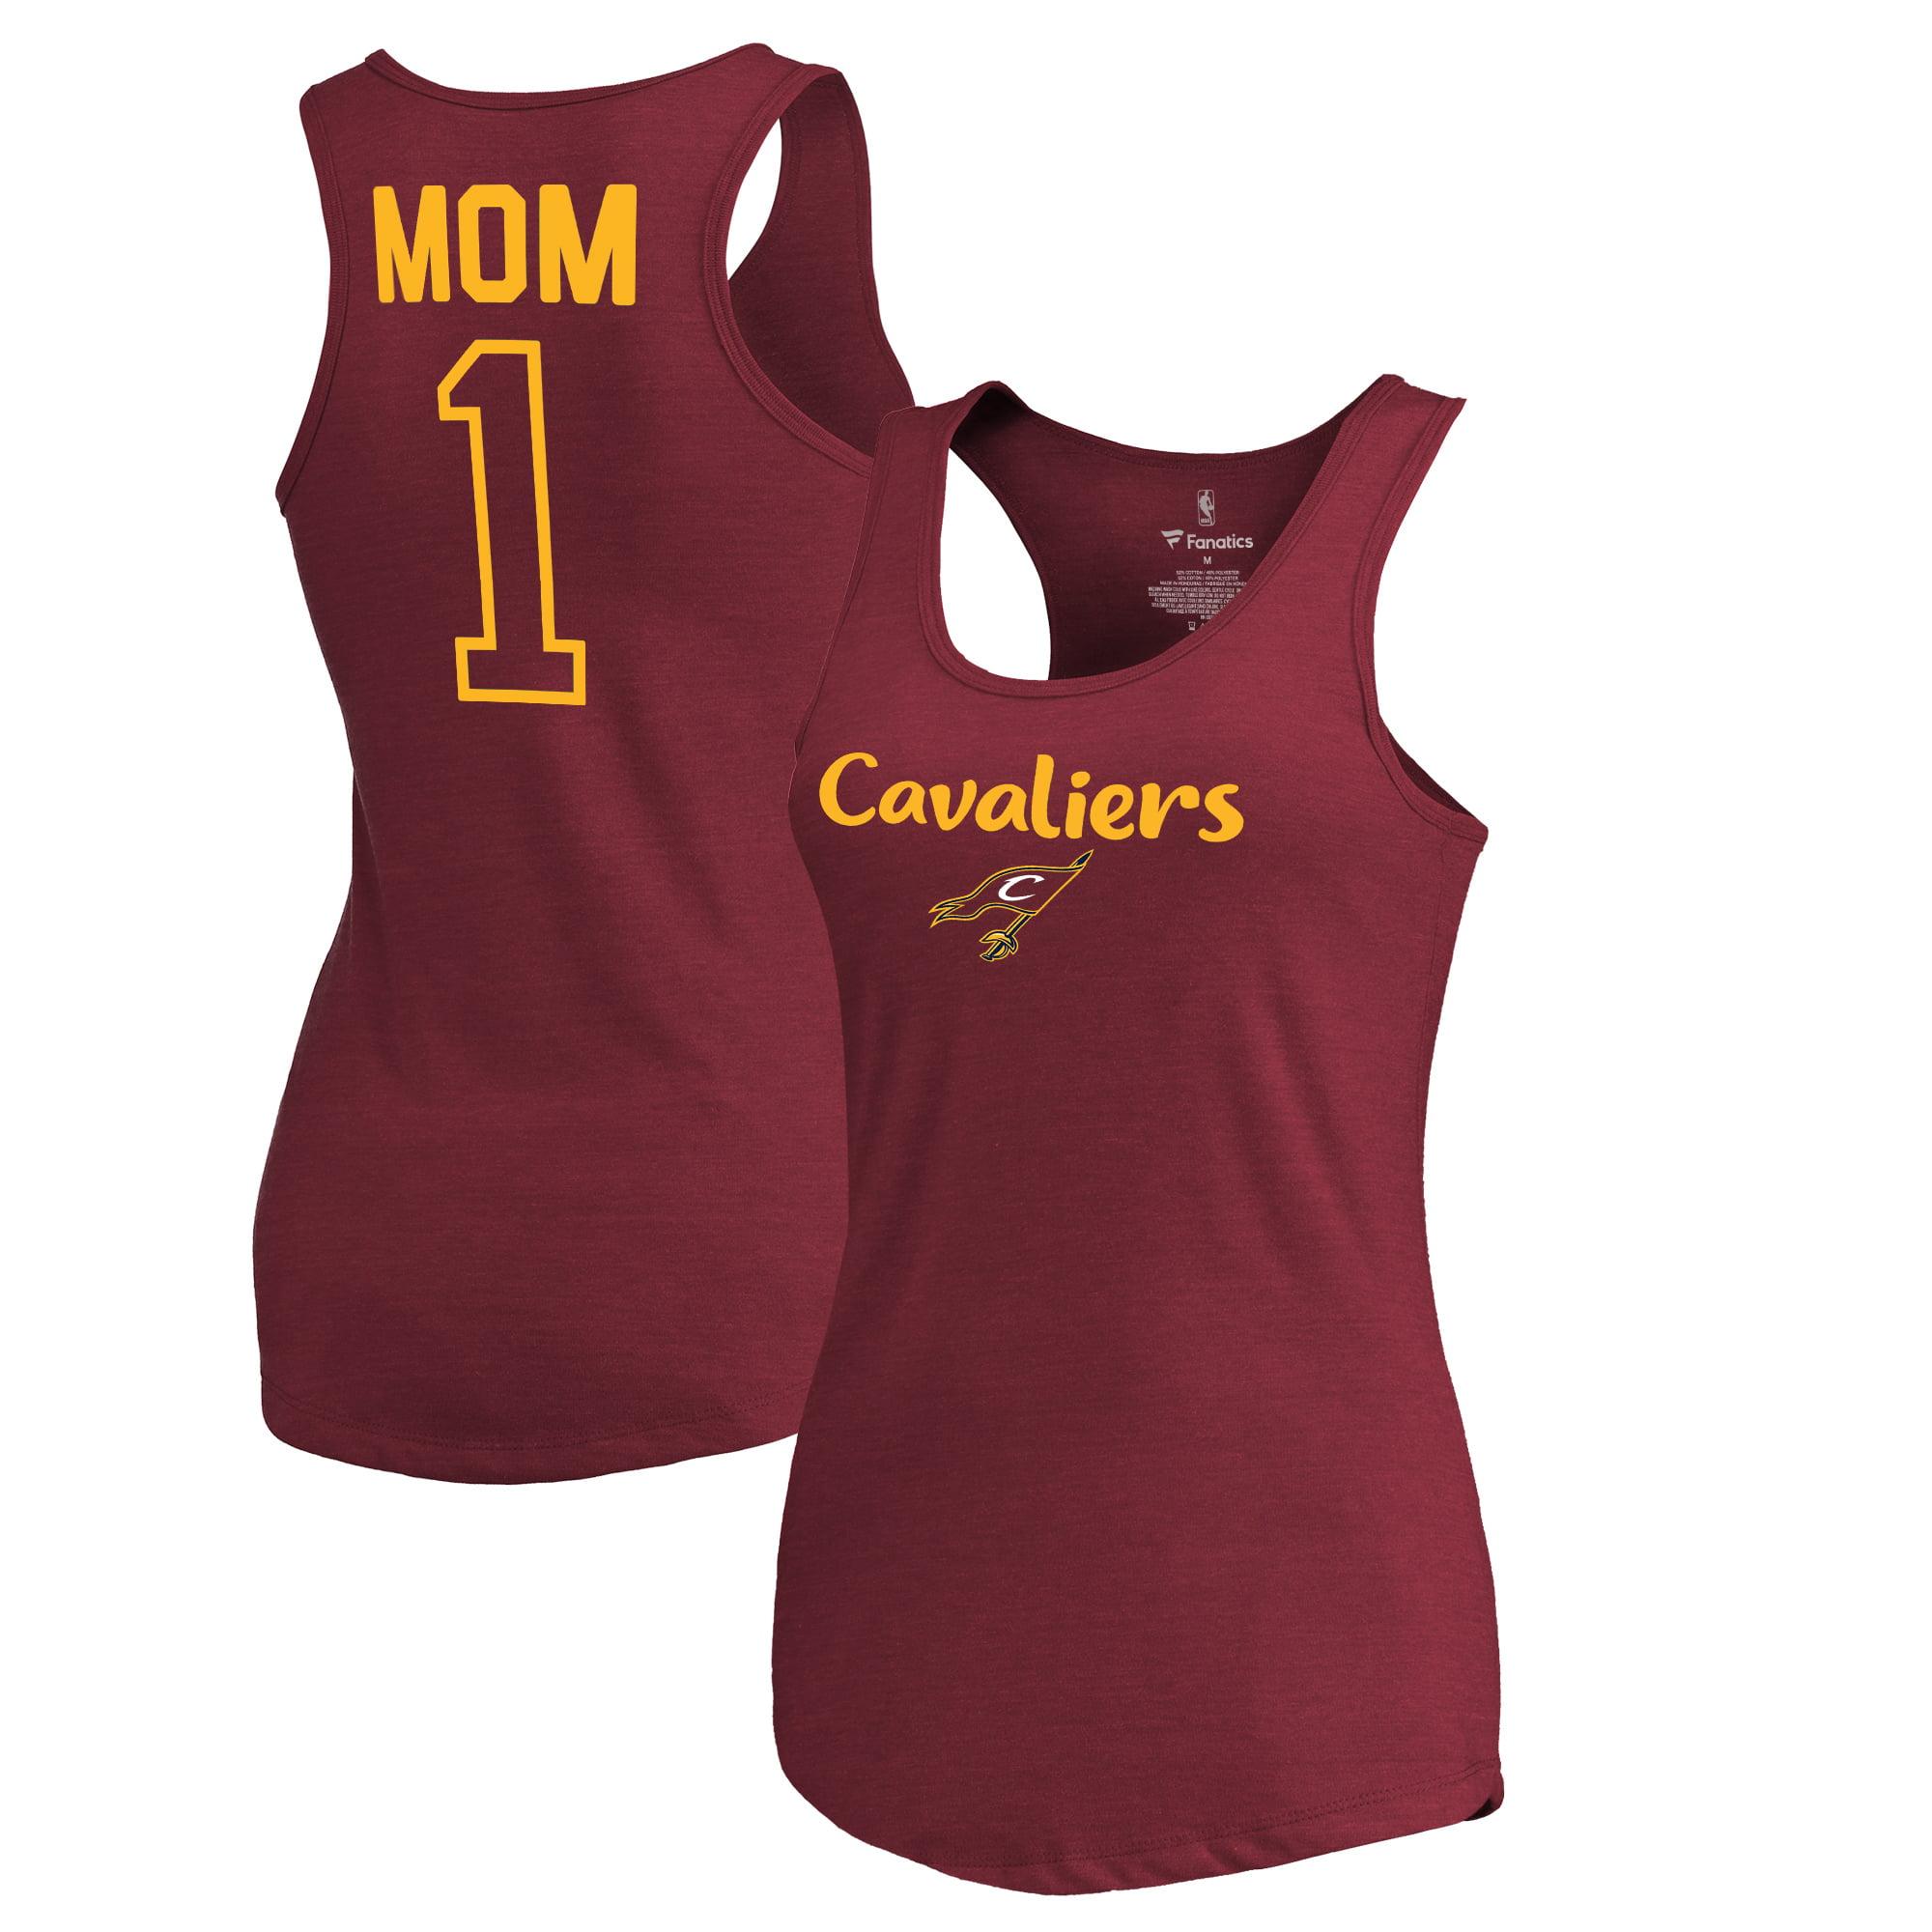 Cleveland Cavaliers Fanatics Branded Women's #1 Mom Tri-Blend Tank Top - Wine